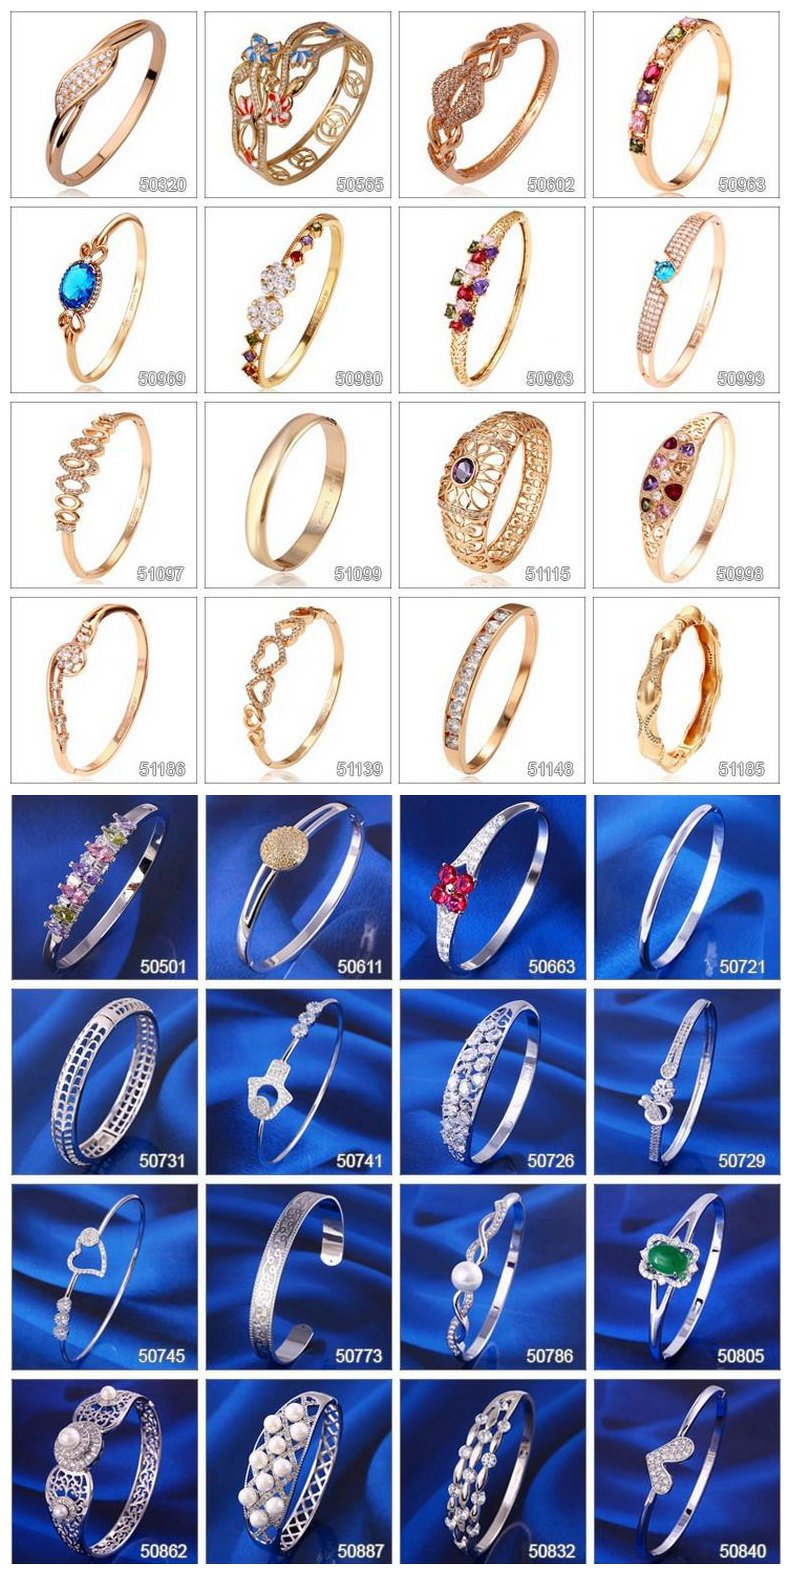 Bangle -63 Fashion Elegant Rhinestone Jewelry Ring Bangle in 24k Gold Color